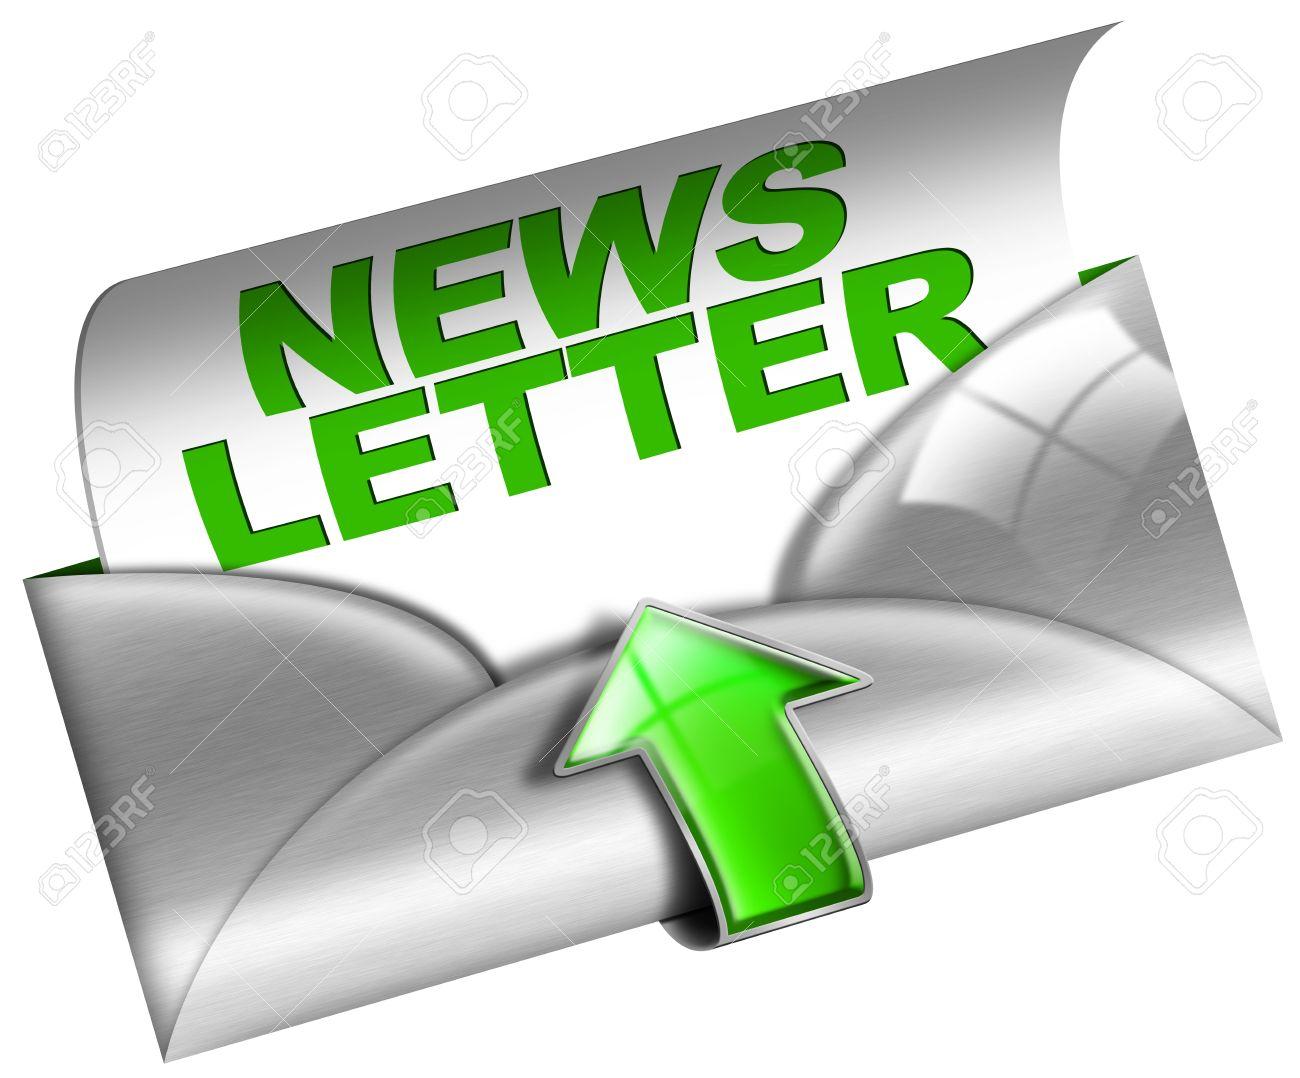 Newsletter marketing concept on white background Stock Photo - 13486844